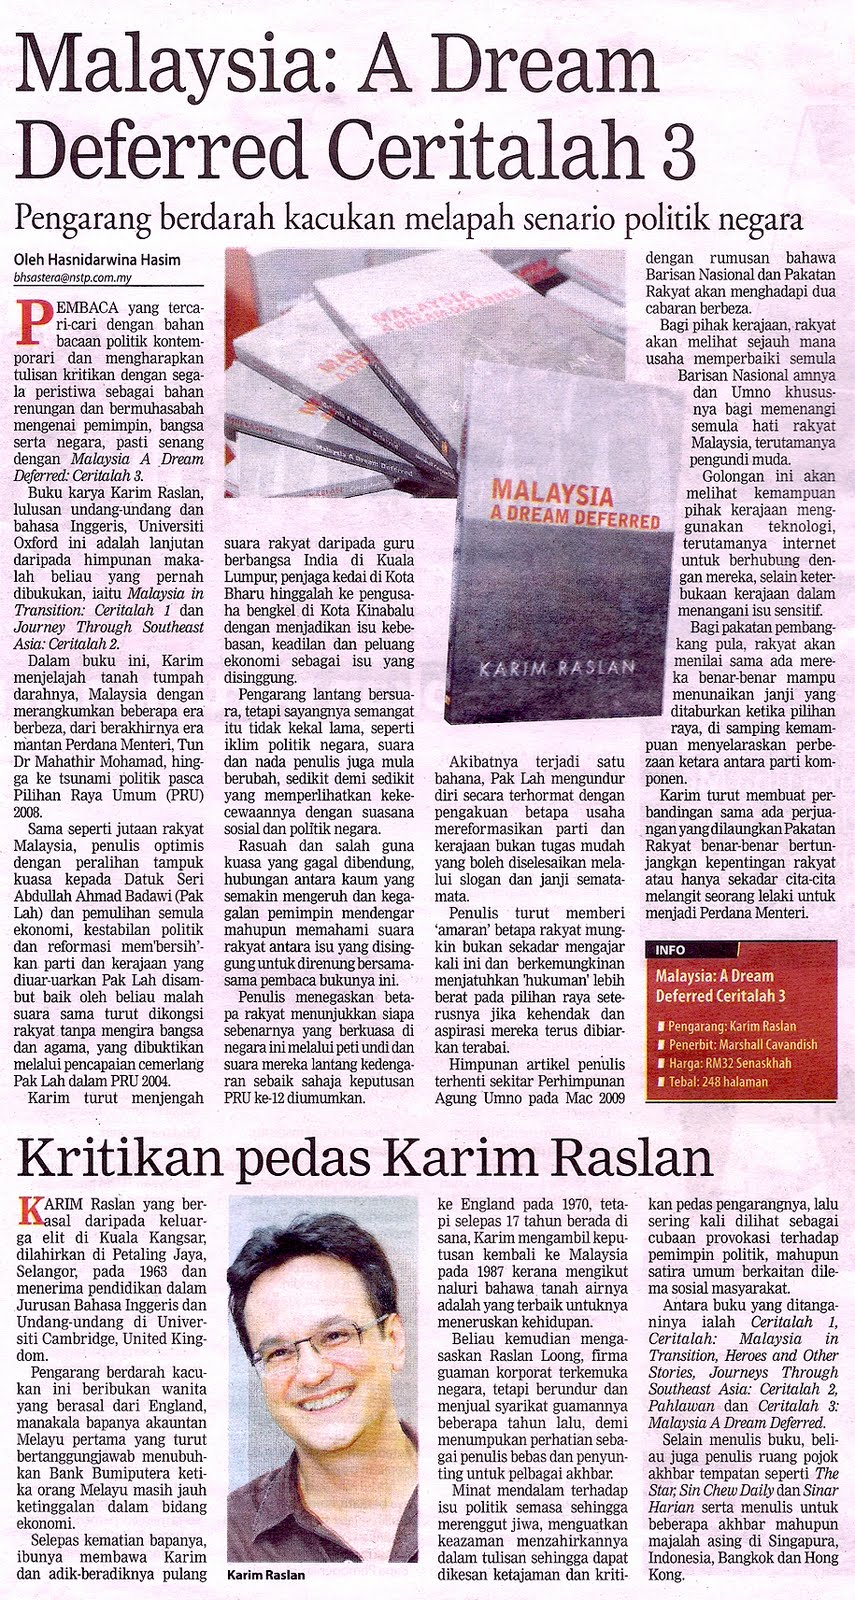 [Malaysia++A+Dream+Deferred+(Ceritalah+3)_BH_Jum+13+Nov+09_25+Zulqaedah+1430.jpg]